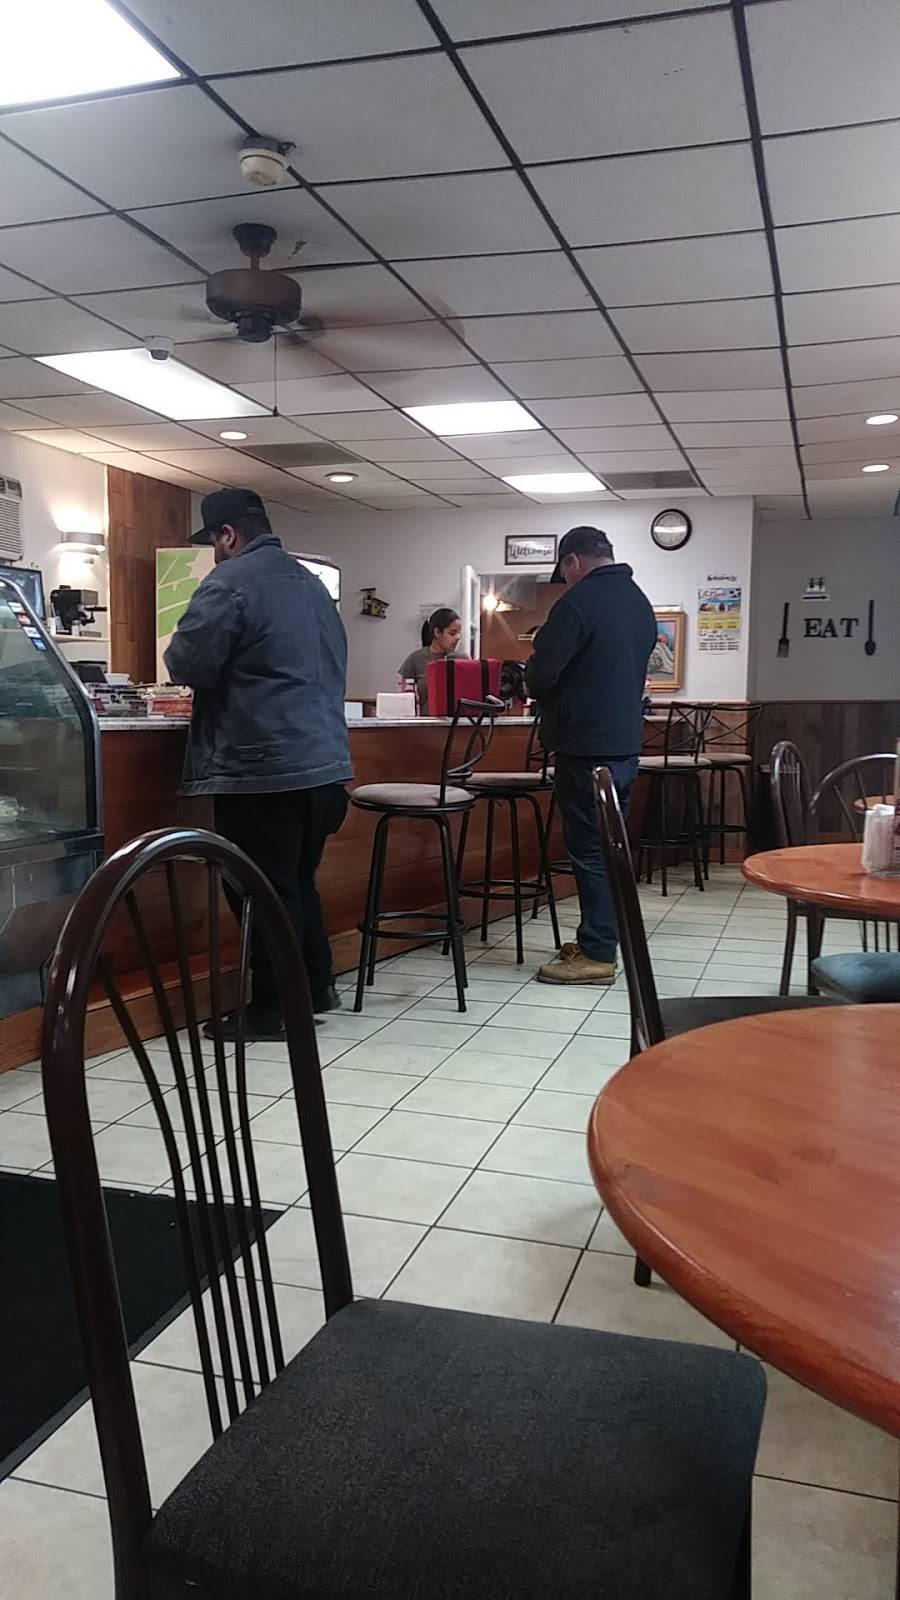 La Cueva Restaurant | restaurant | 666 Alter St, Hazleton, PA 18201, USA | 5708618041 OR +1 570-861-8041